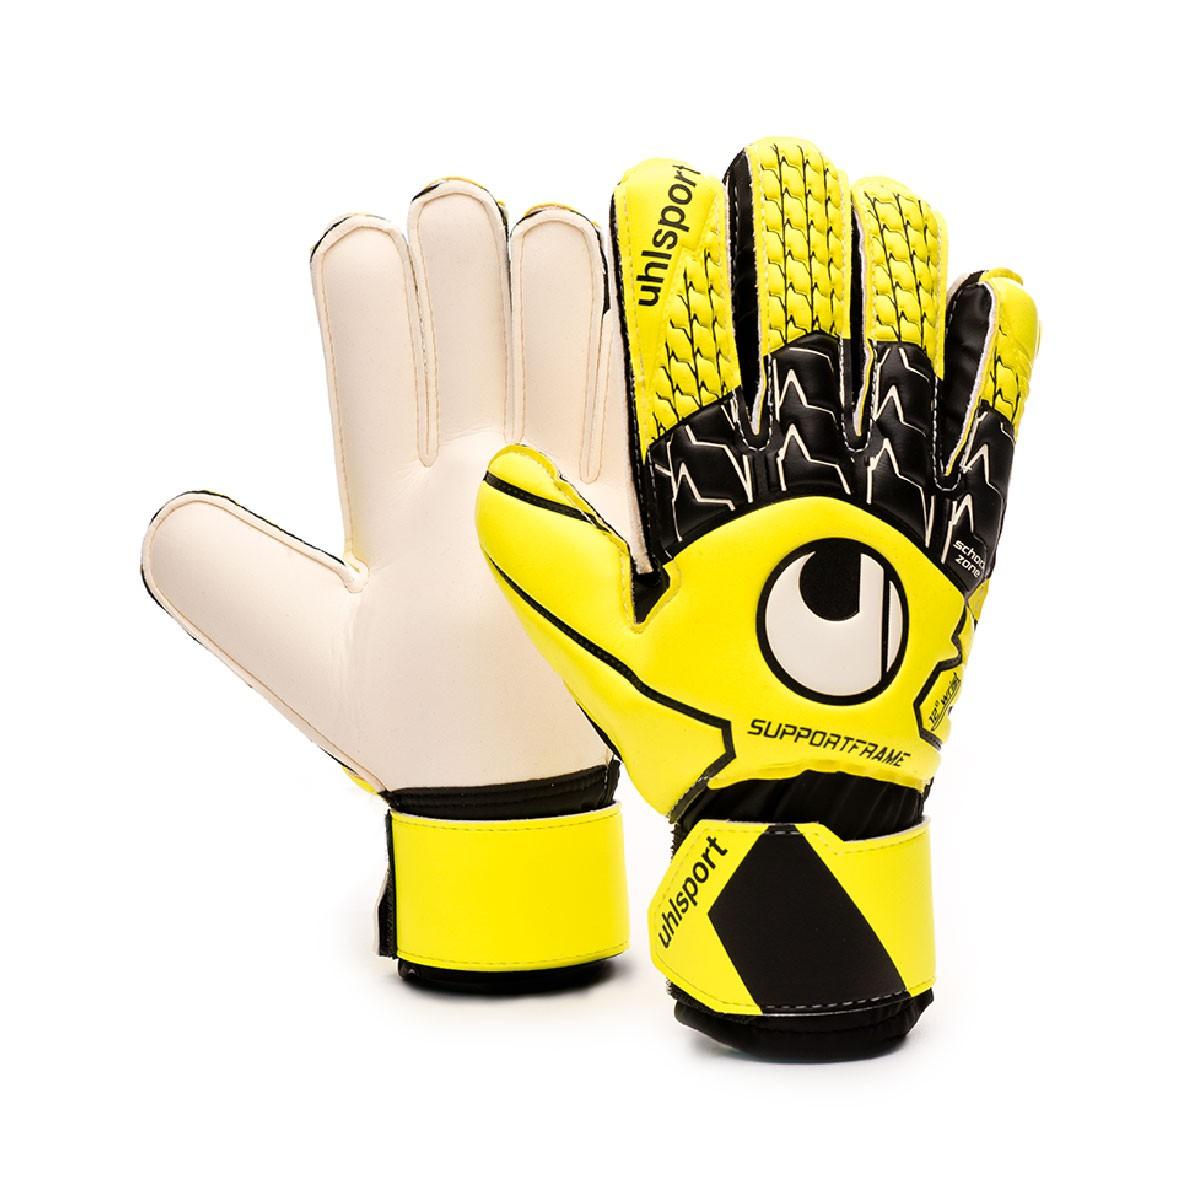 f42e30174 Glove Uhlsport Soft SF Niño Fluor yellow-Black-White - Tienda de fútbol  Fútbol Emotion